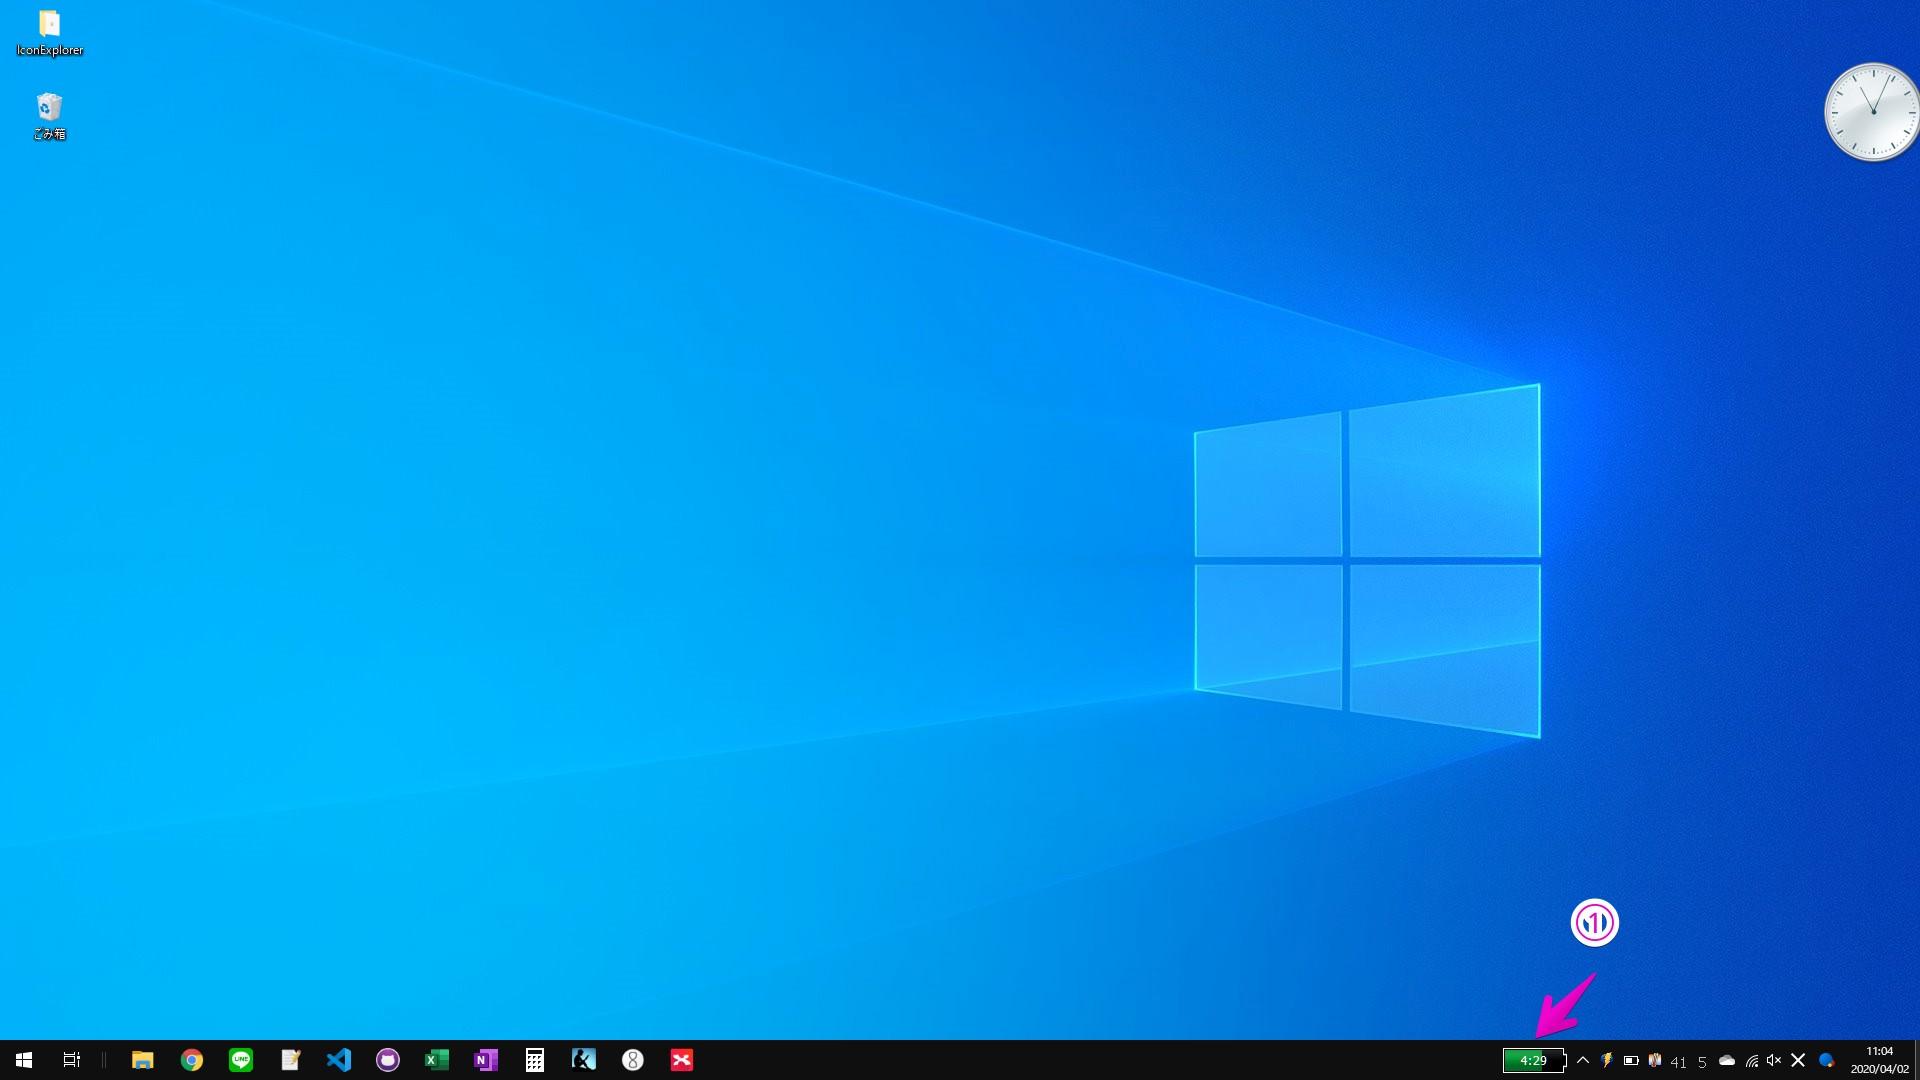 Windowsのタスクトレイ上のBatteryBar